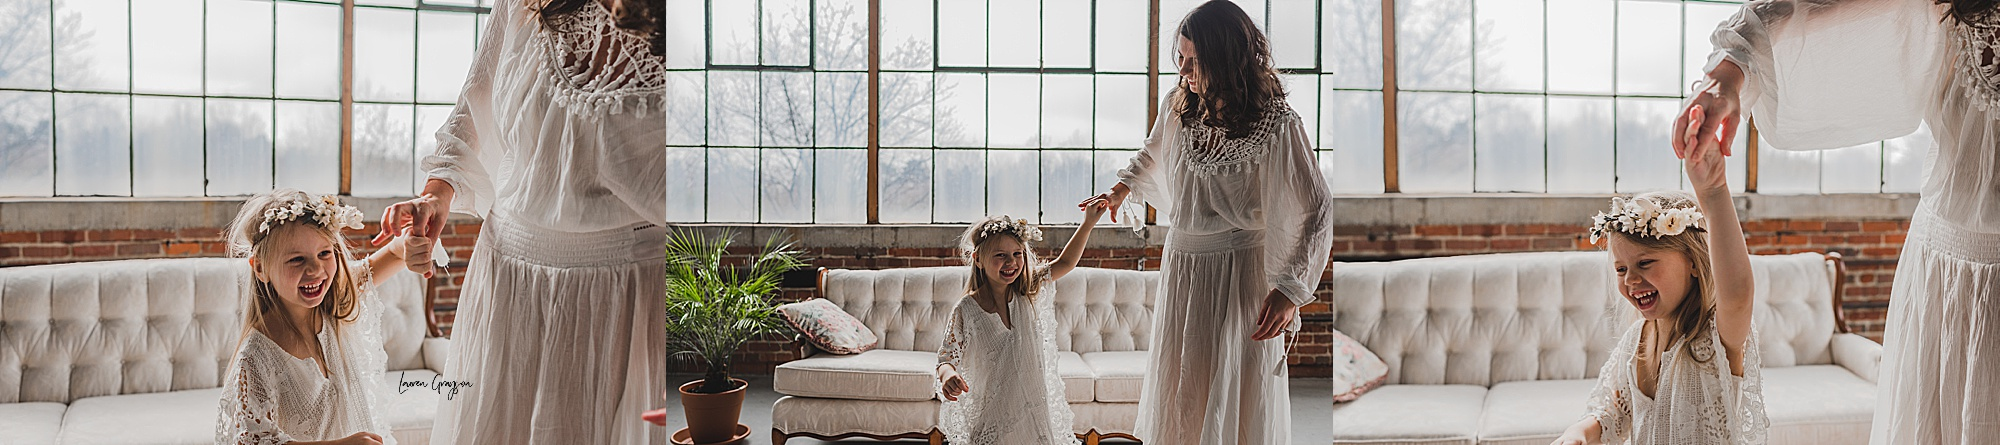 lauren-grayson-photography-canton-ohio-newborn-family-photographer-woods-lacey_0068.jpg